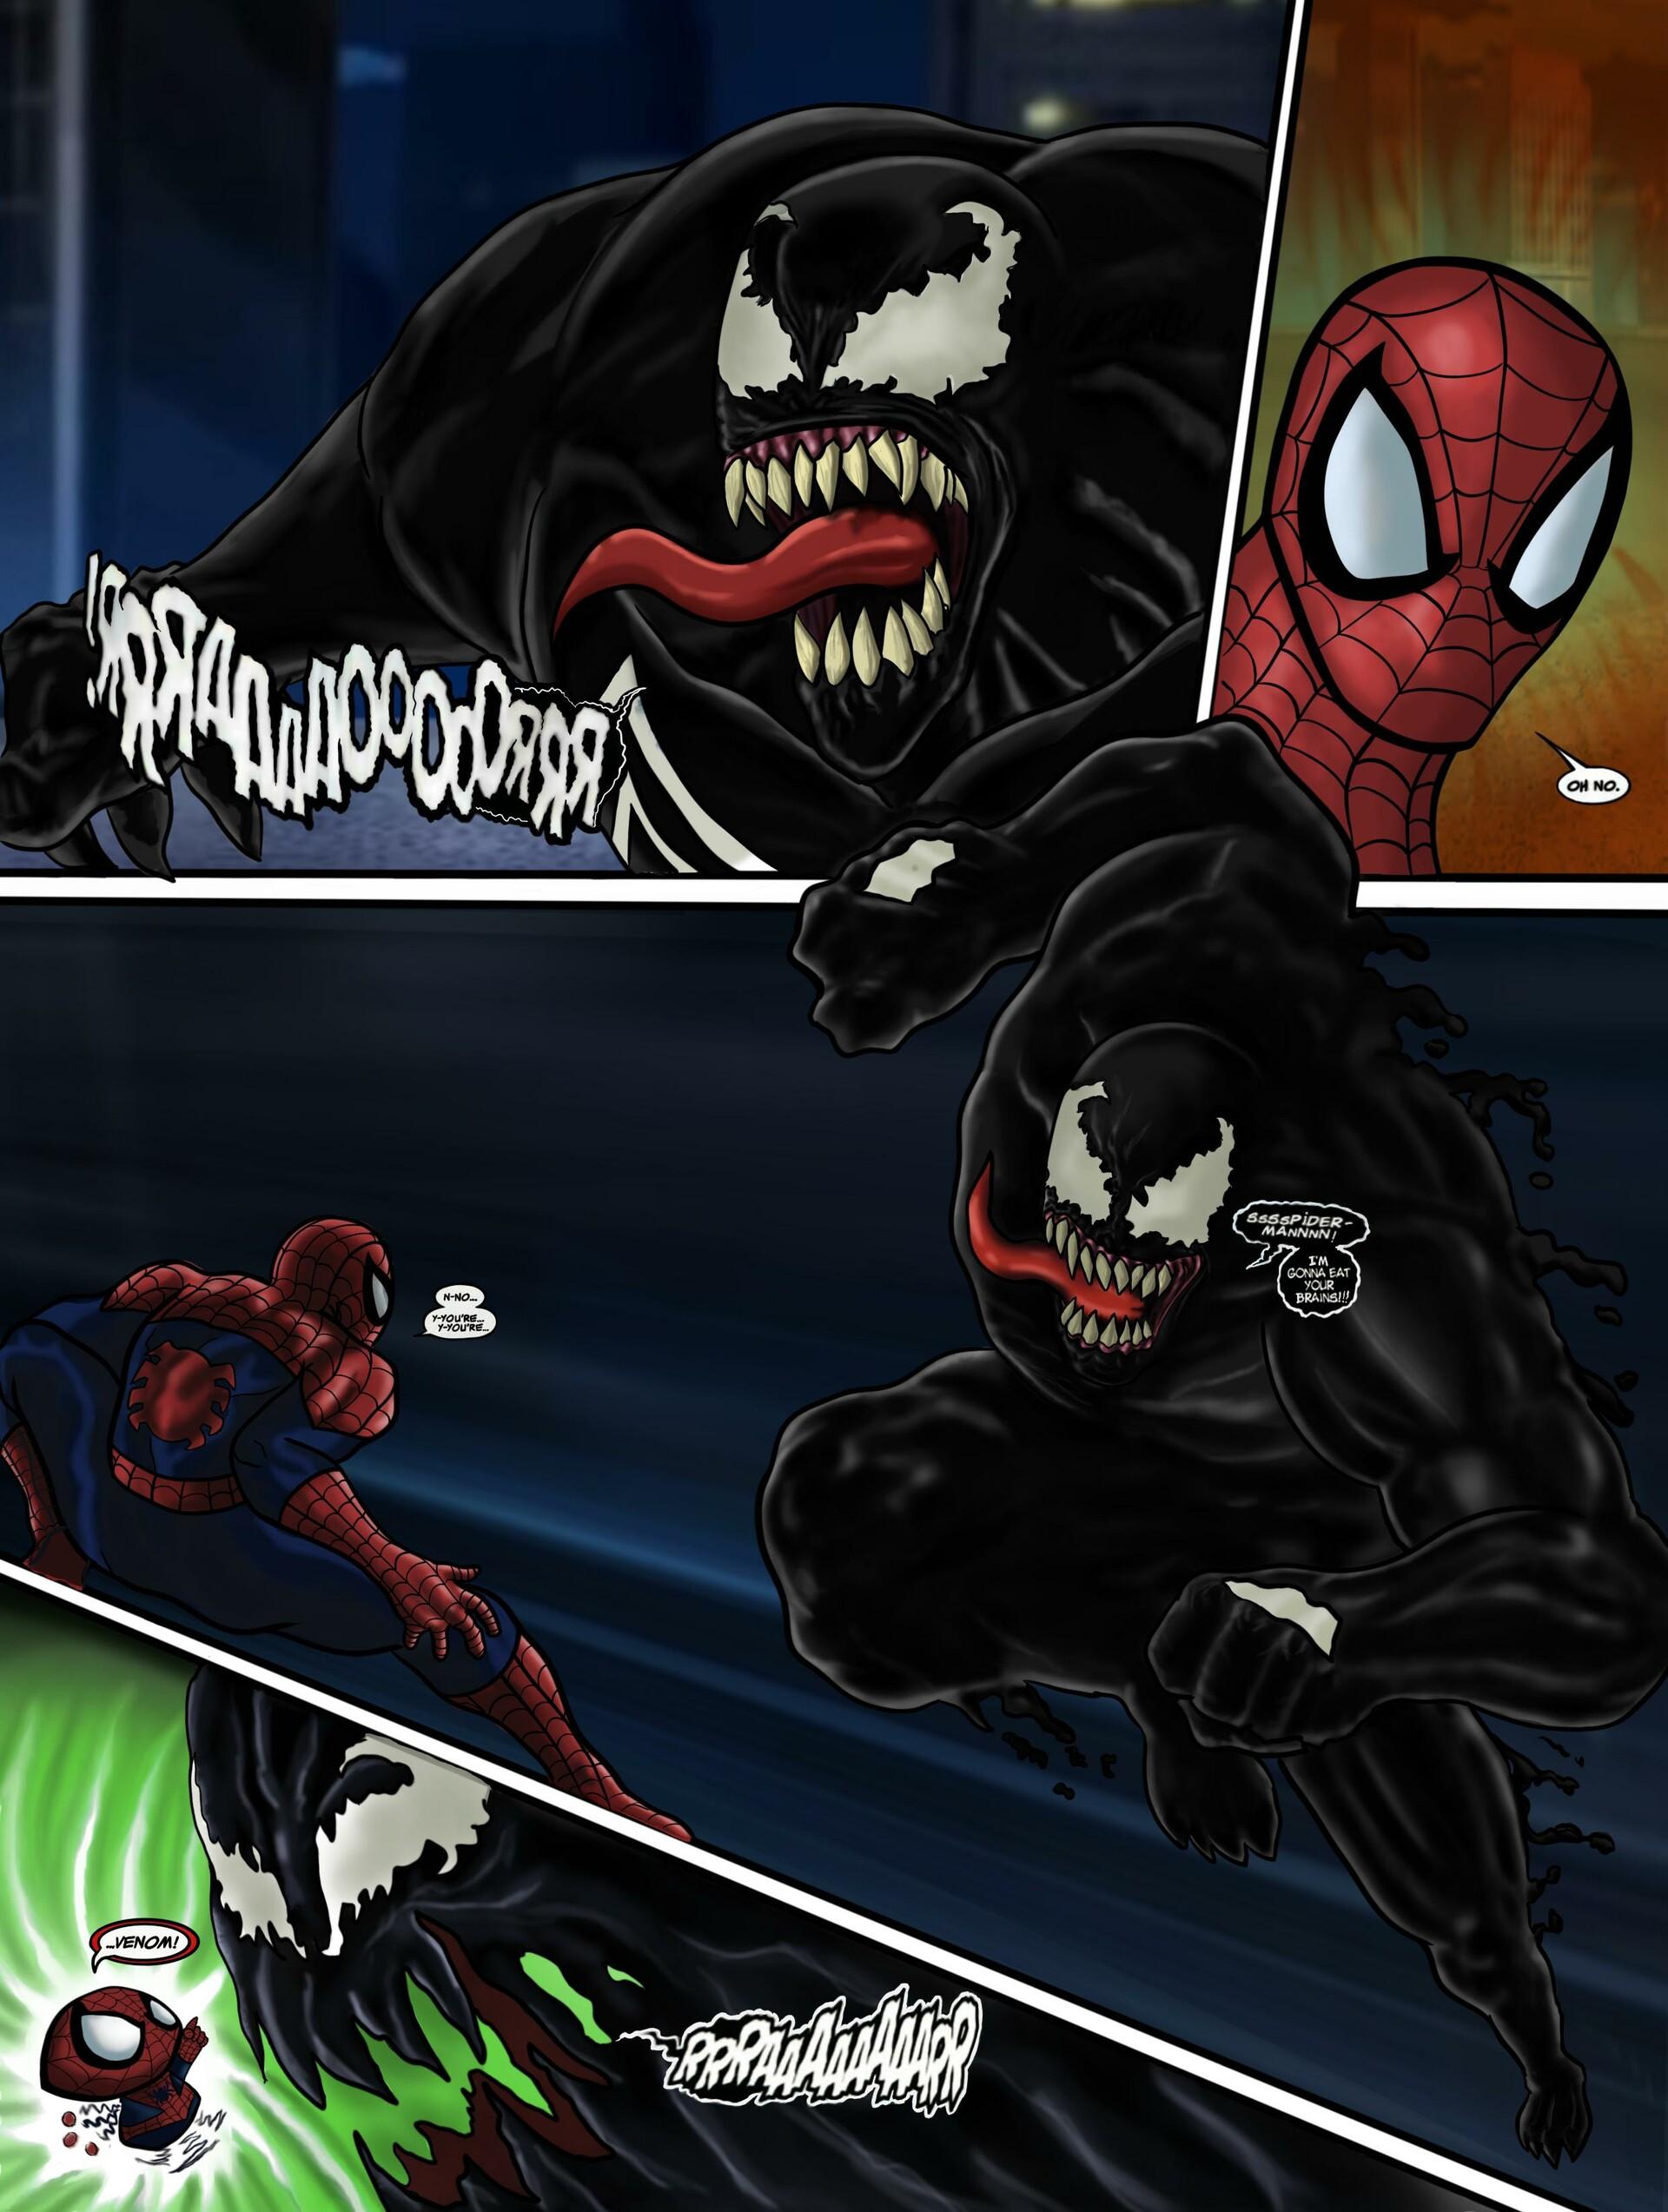 Ultimate Spider-man Venom : ultimate, spider-man, venom, ArtStation, Ultimate, Spiderman, Venom,, Quintas